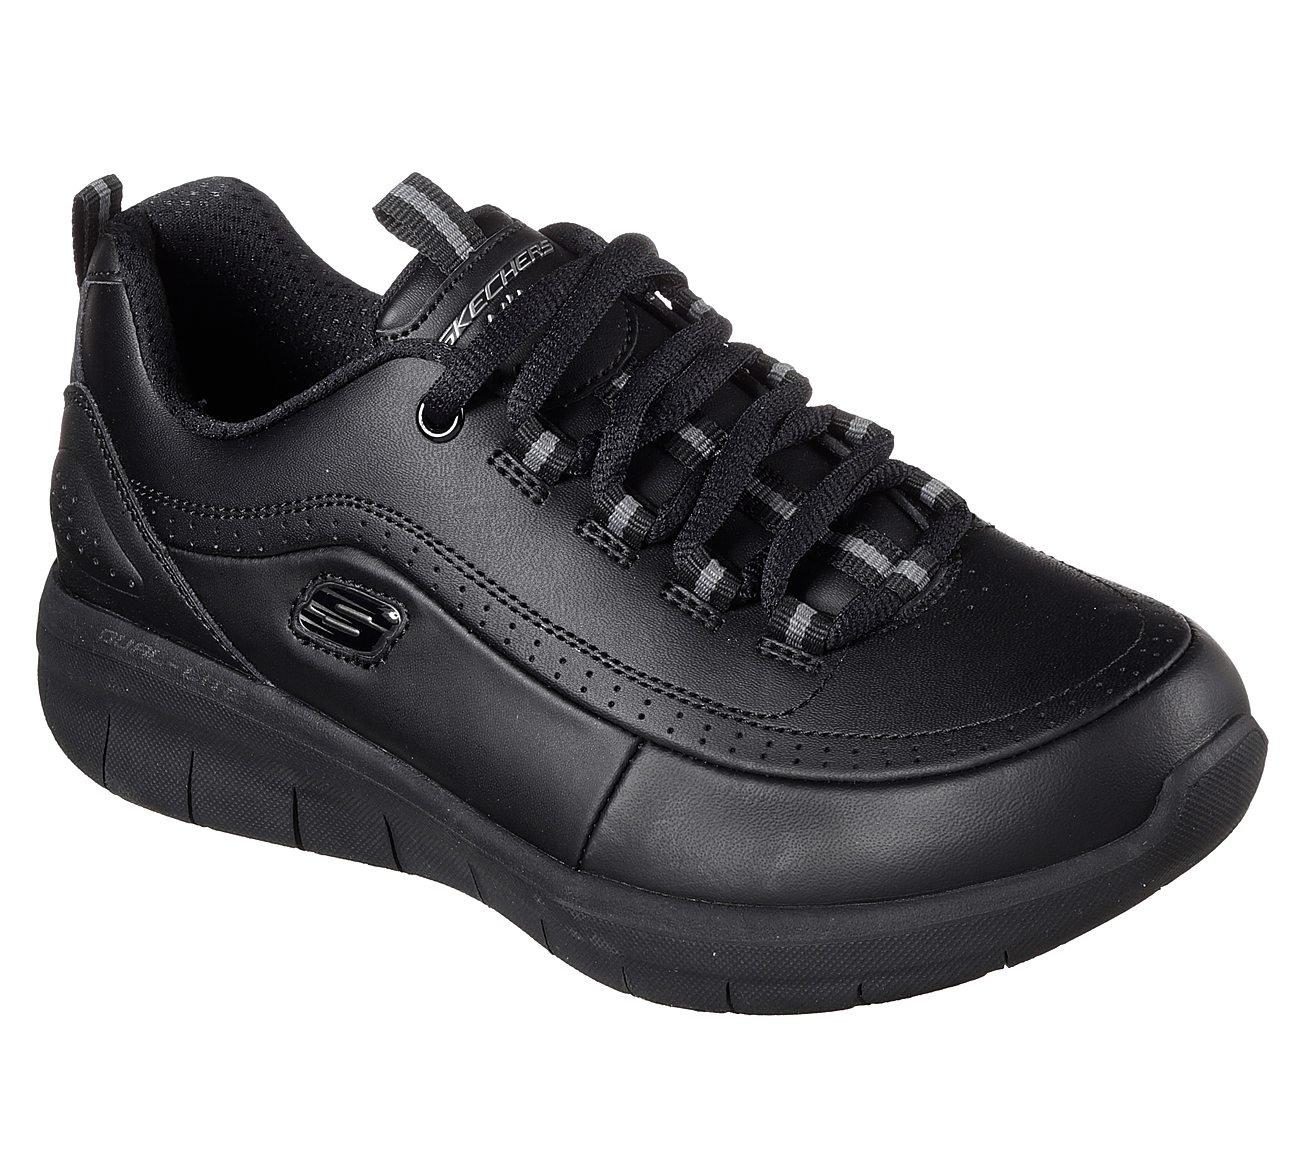 Skechers Synergy 2.0 Chain Reaction Womens Sneakers B01NBWXZD9 7 B(M) US|Black